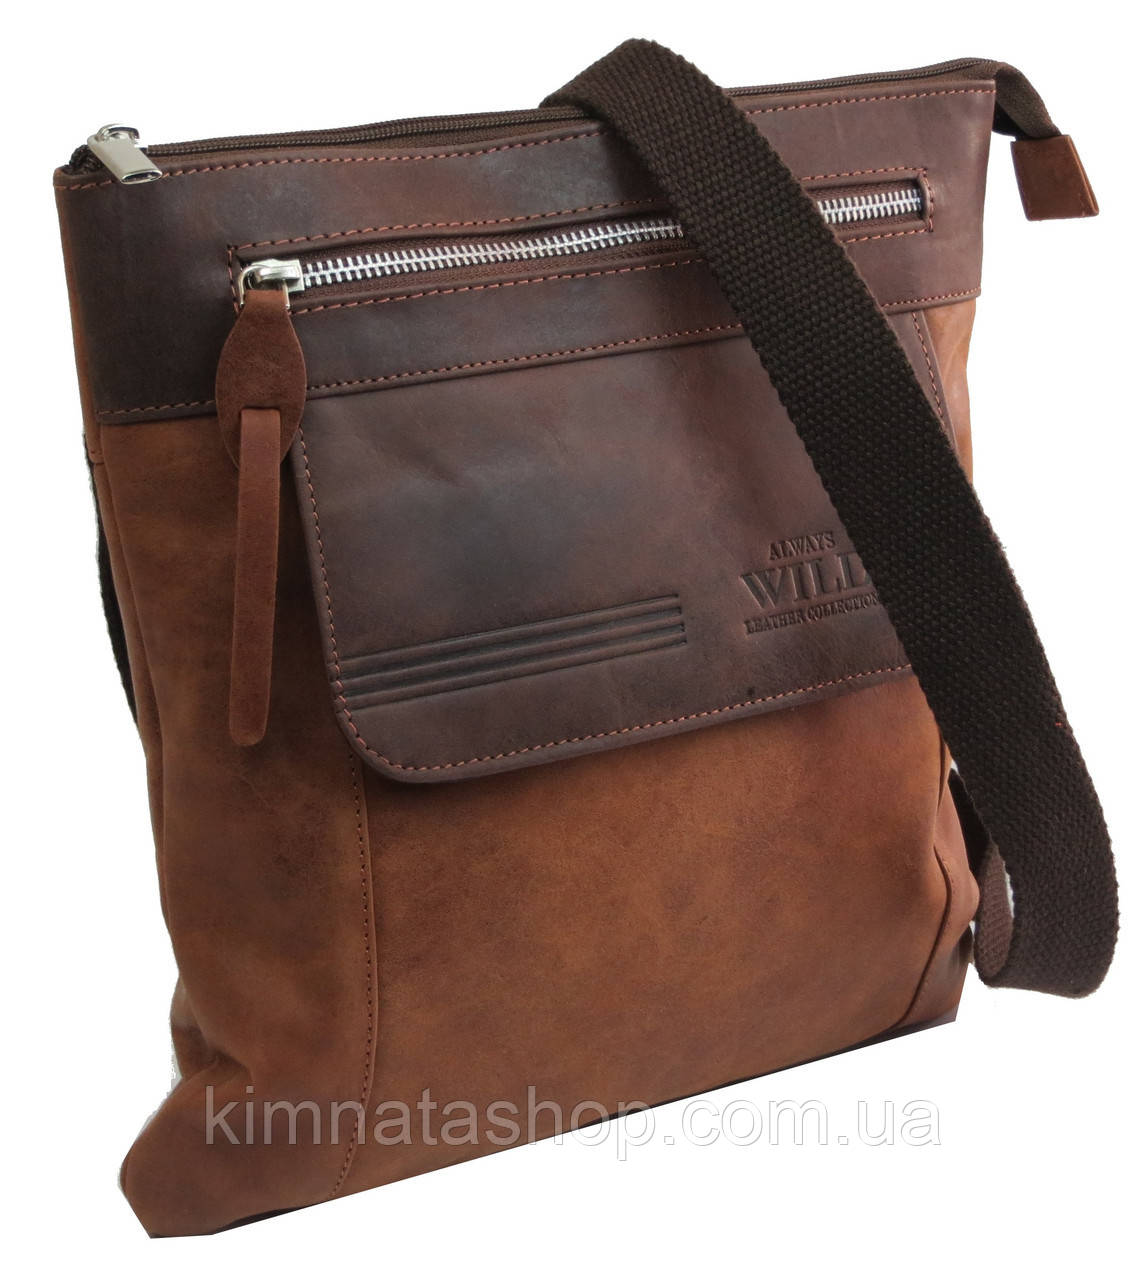 Вертикальная мужская кожаная сумка Always Wild BAG4HB